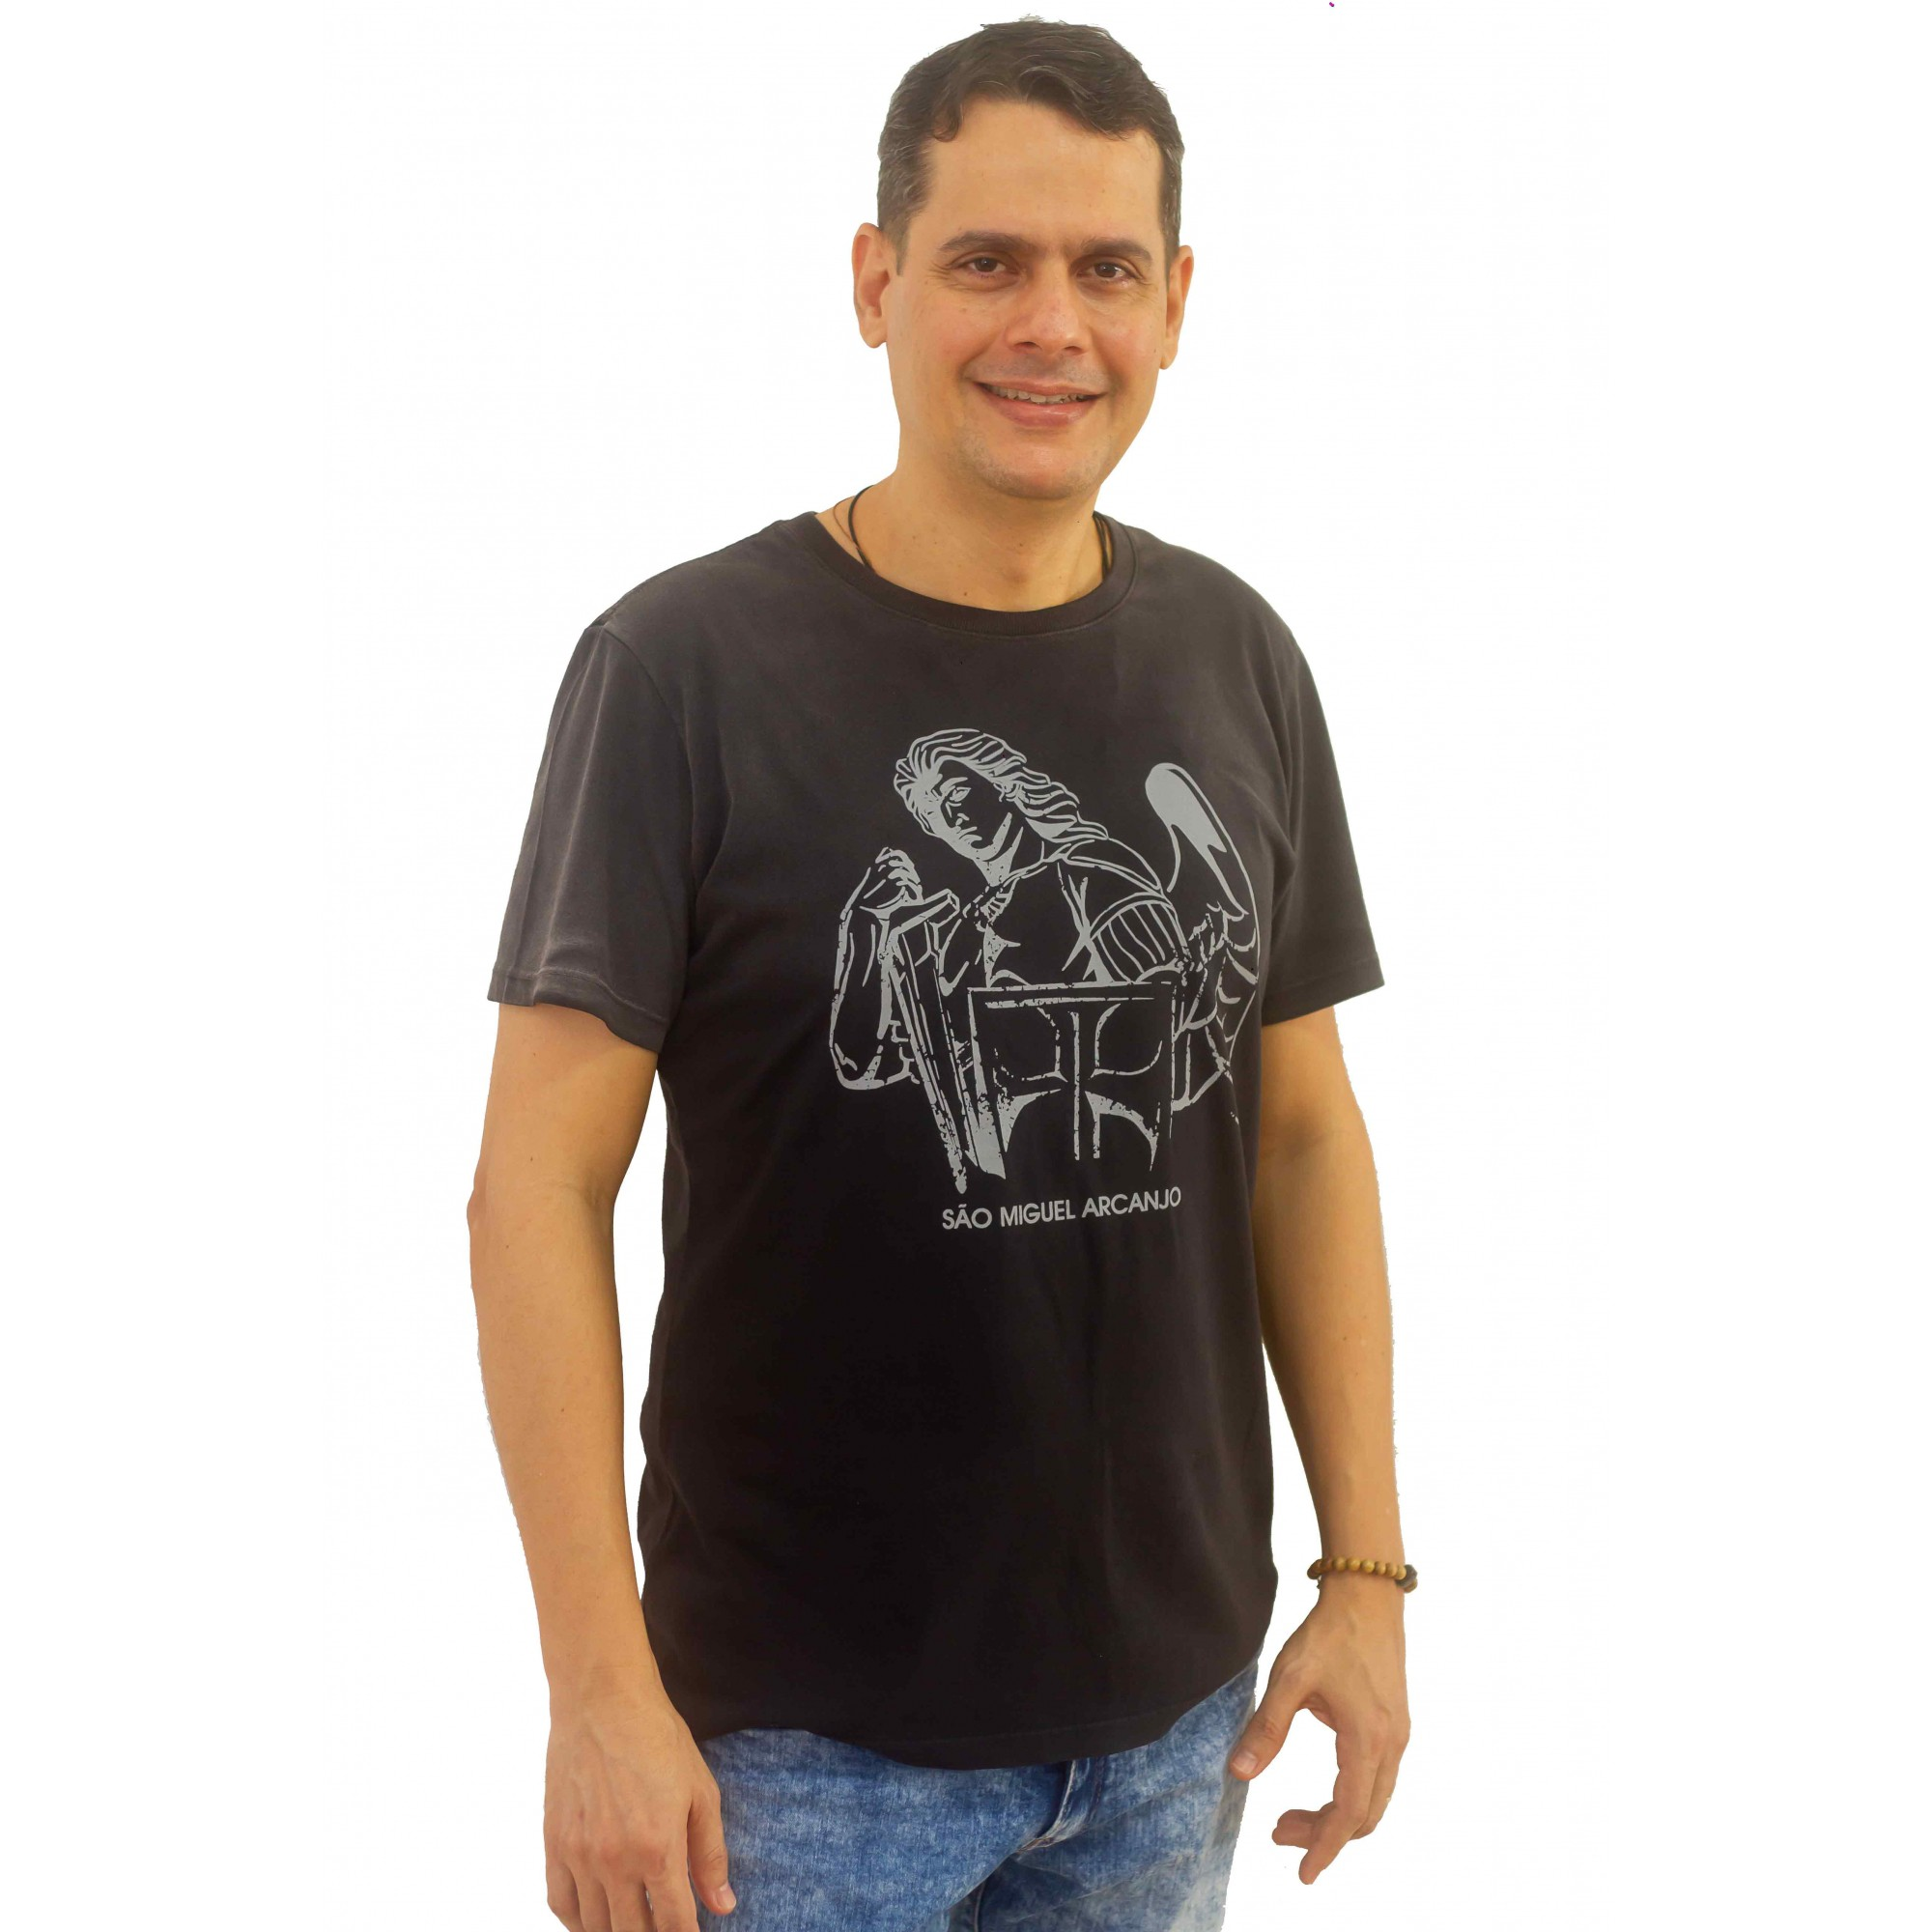 CAMISETA SÃO MIGUEL ARCANJO PRETA USED DEGRADÊ